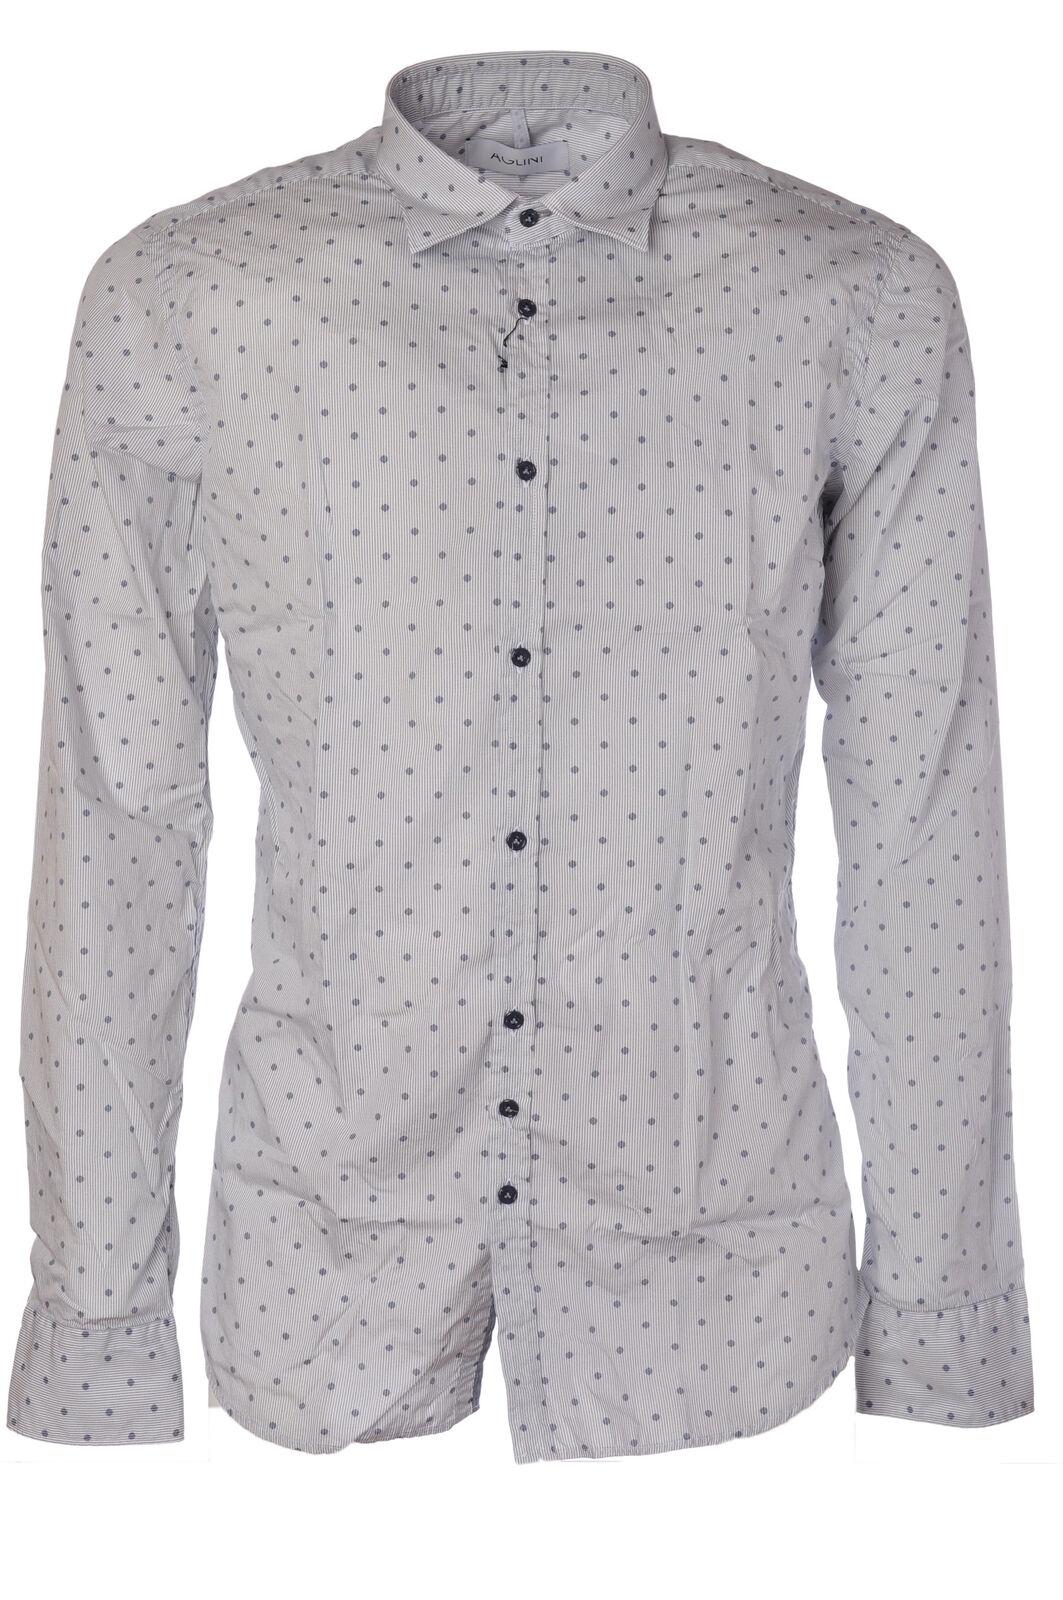 Aglini - Shirts-Shirt - Man - White - 480515C183610